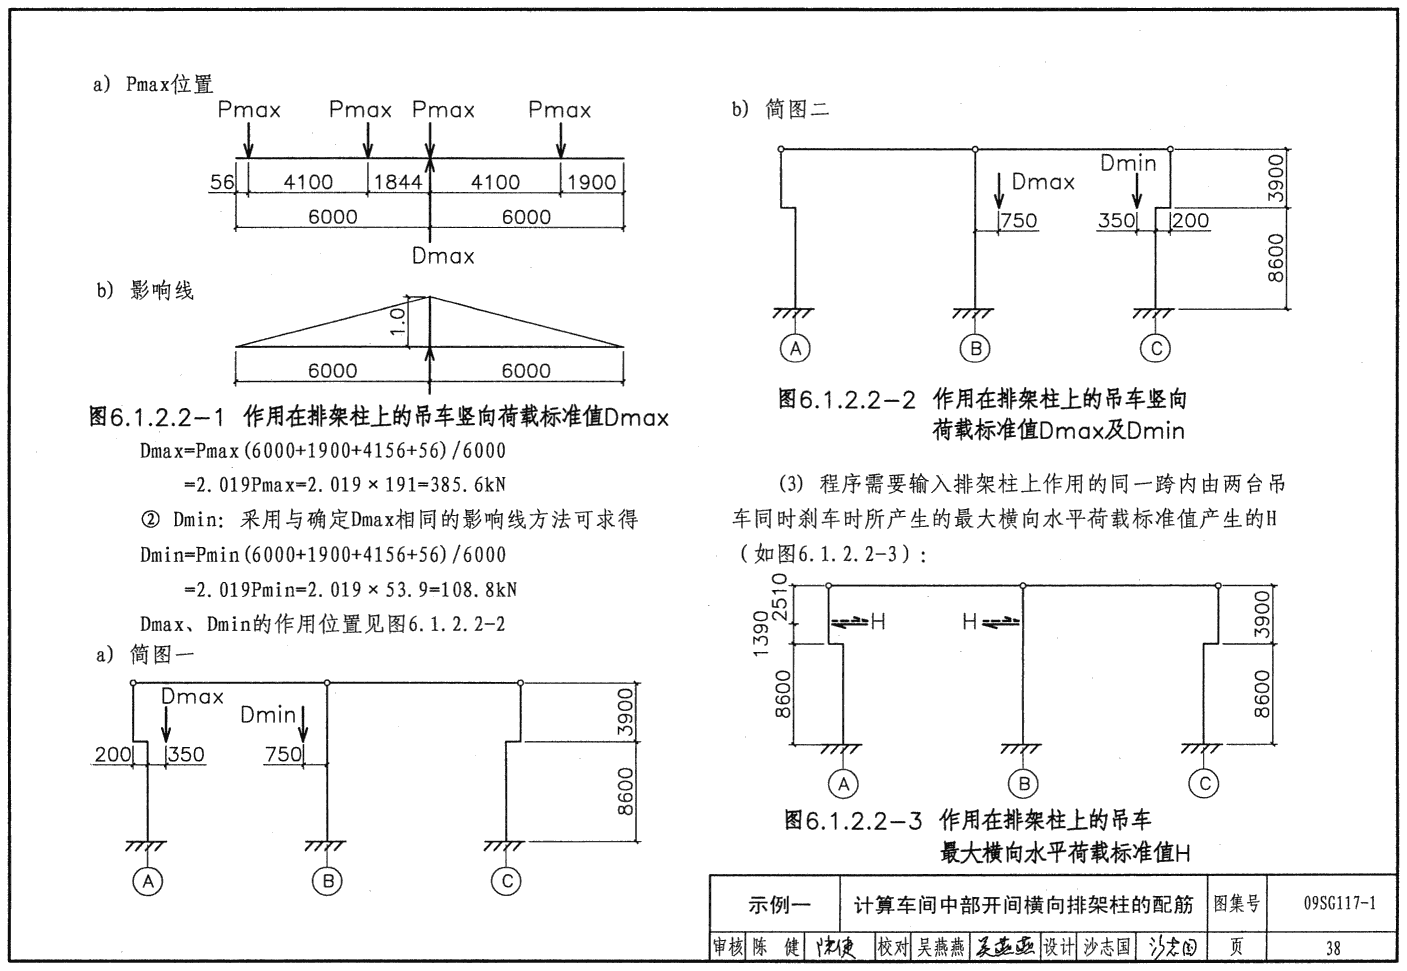 09sg117-1:单层工业厂房设计示例(一)